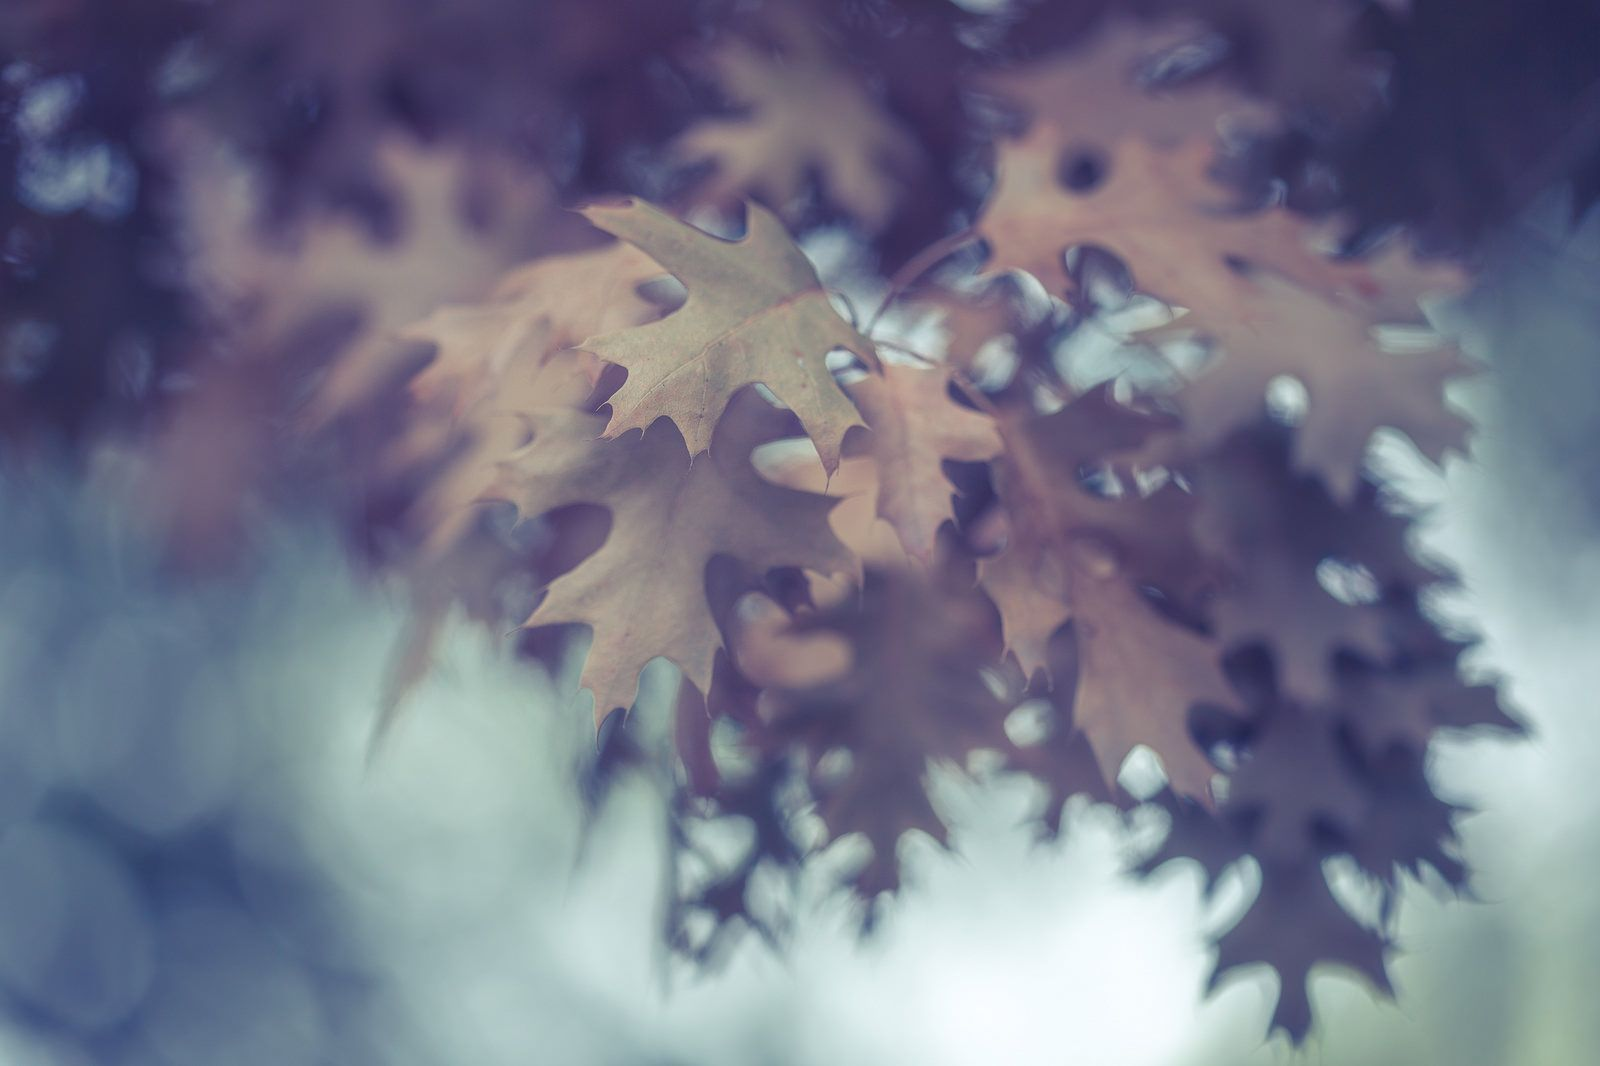 Bienvenido otoño!! #bienvenidootoño Bienvenido otoño!! | by magova #bienvenidootoño Bienvenido otoño!! #bienvenidootoño Bienvenido otoño!! | by magova #bienvenidootoño Bienvenido otoño!! #bienvenidootoño Bienvenido otoño!! | by magova #bienvenidootoño Bienvenido otoño!! #bienvenidootoño Bienvenido otoño!! | by magova #bienvenidootoño Bienvenido otoño!! #bienvenidootoño Bienvenido otoño!! | by magova #bienvenidootoño Bienvenido otoño!! #bienvenidootoño Bienvenido otoño!! | #bienvenidootoño